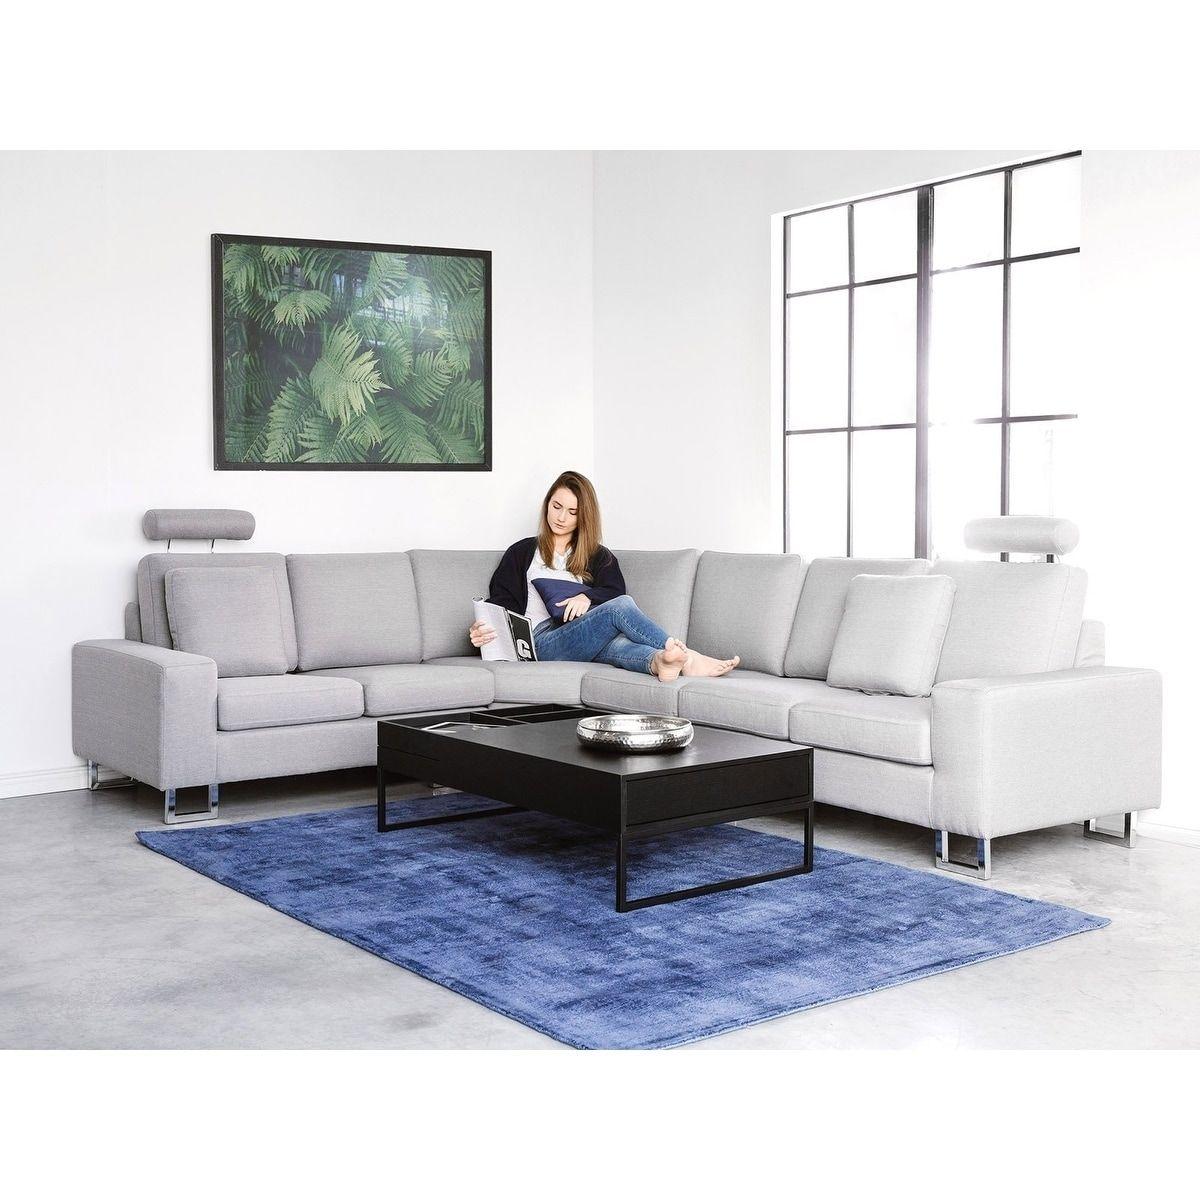 Fabric Sectional Sofa Light Gray Stockholm Grey Beliani